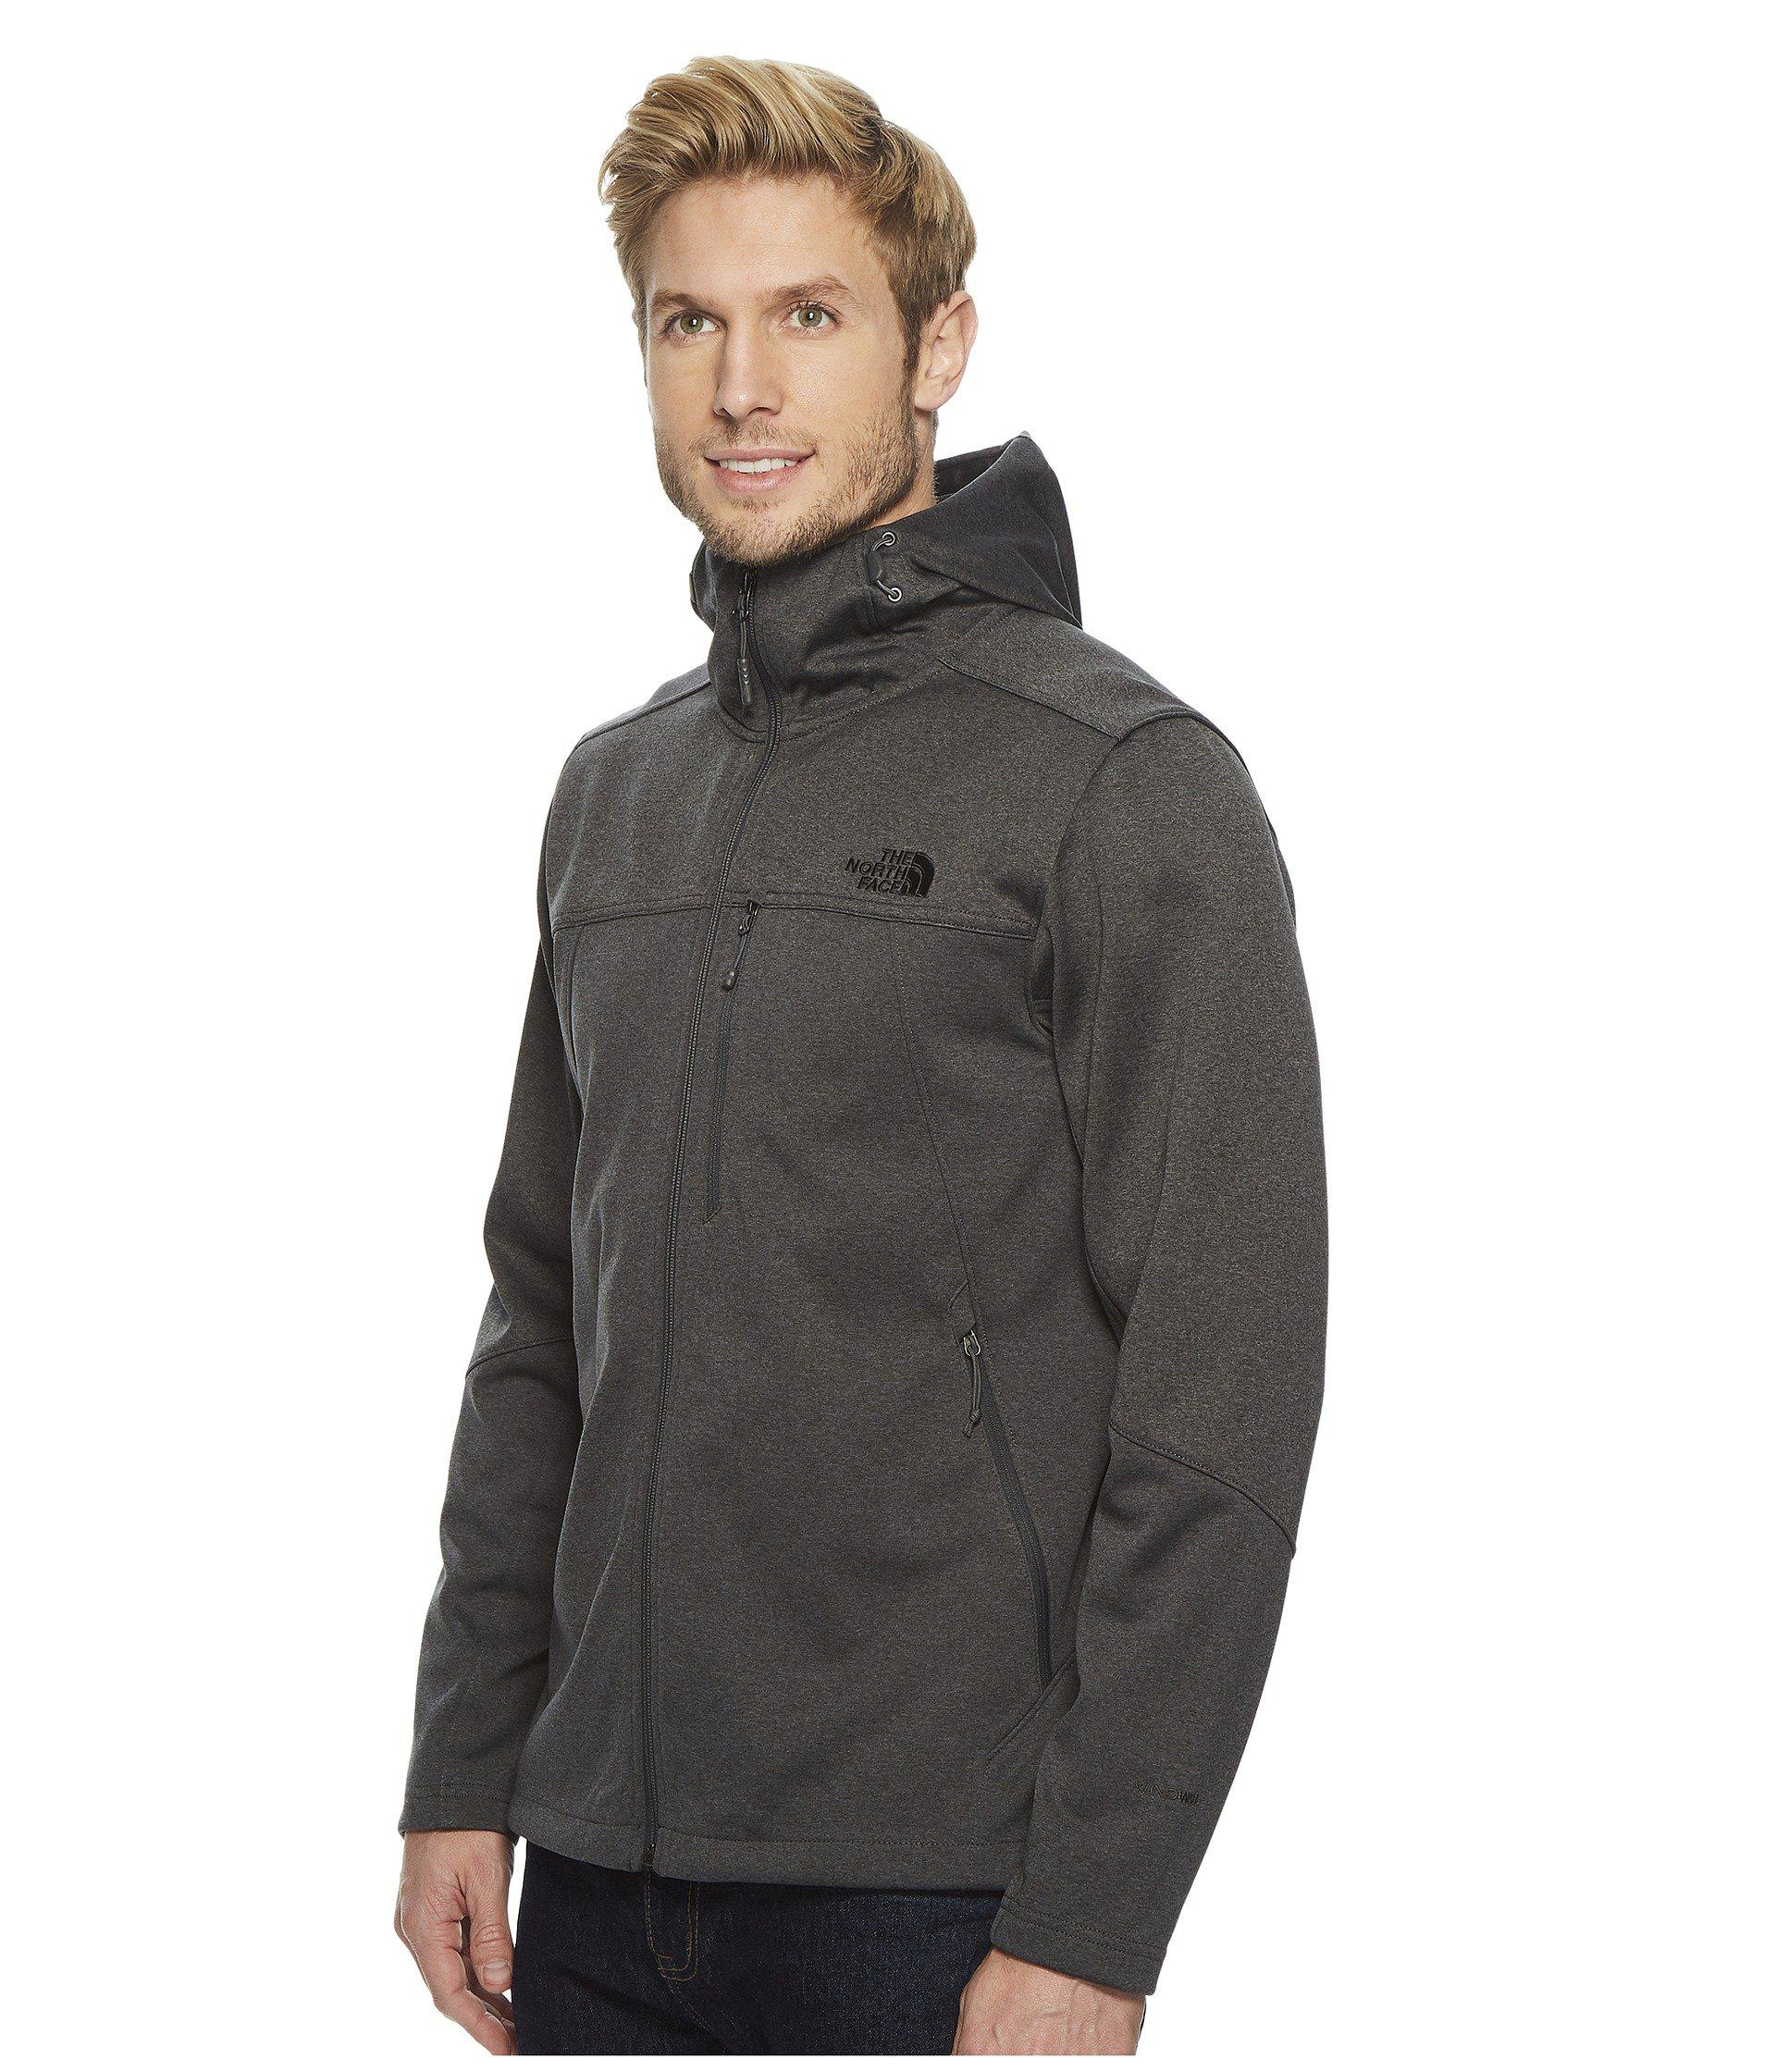 f4cfef641c4b Lyst - The North Face Apex Canyonwall Hybrid Hoodie (tnf Black tnf Black)  Men s Sweatshirt in Gray for Men